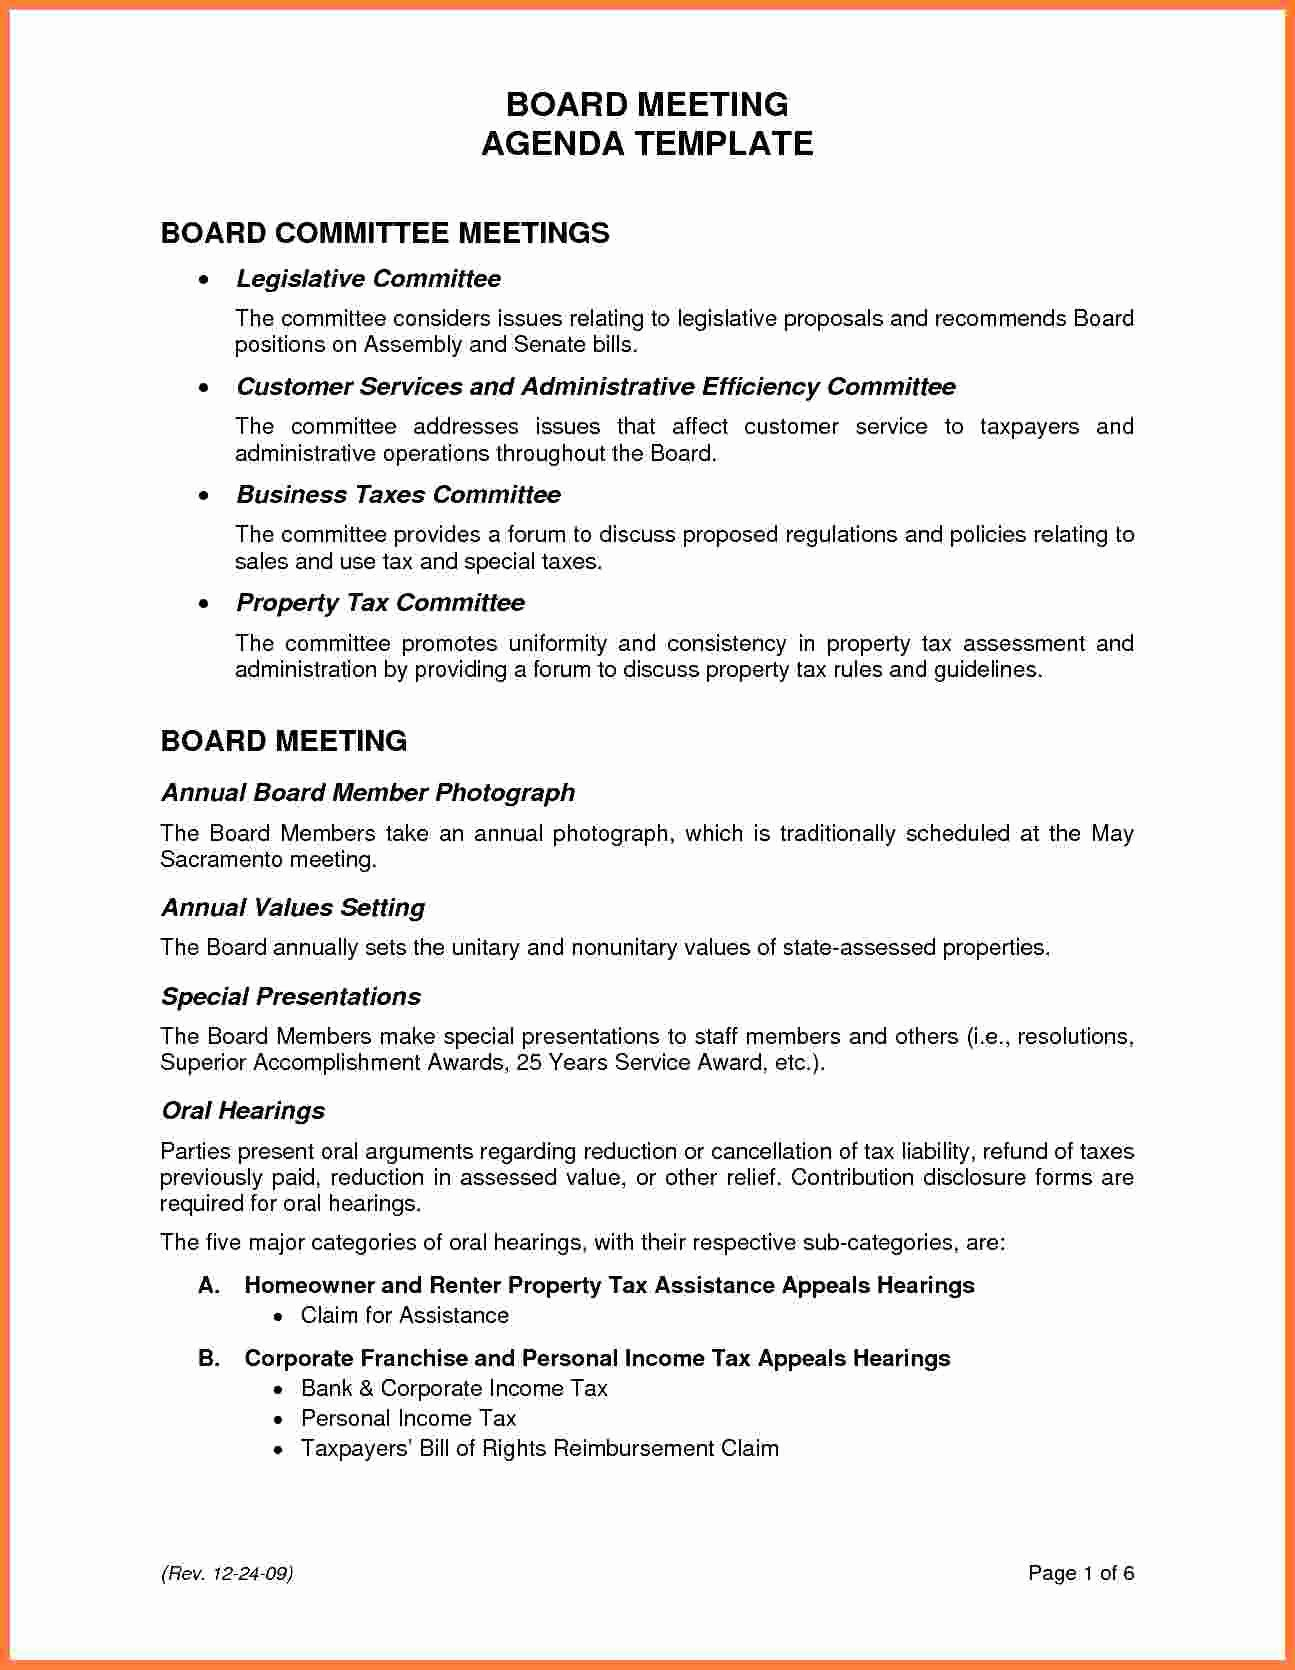 Board Meeting Agenda Template Best Of 5 Board Meeting Agenda